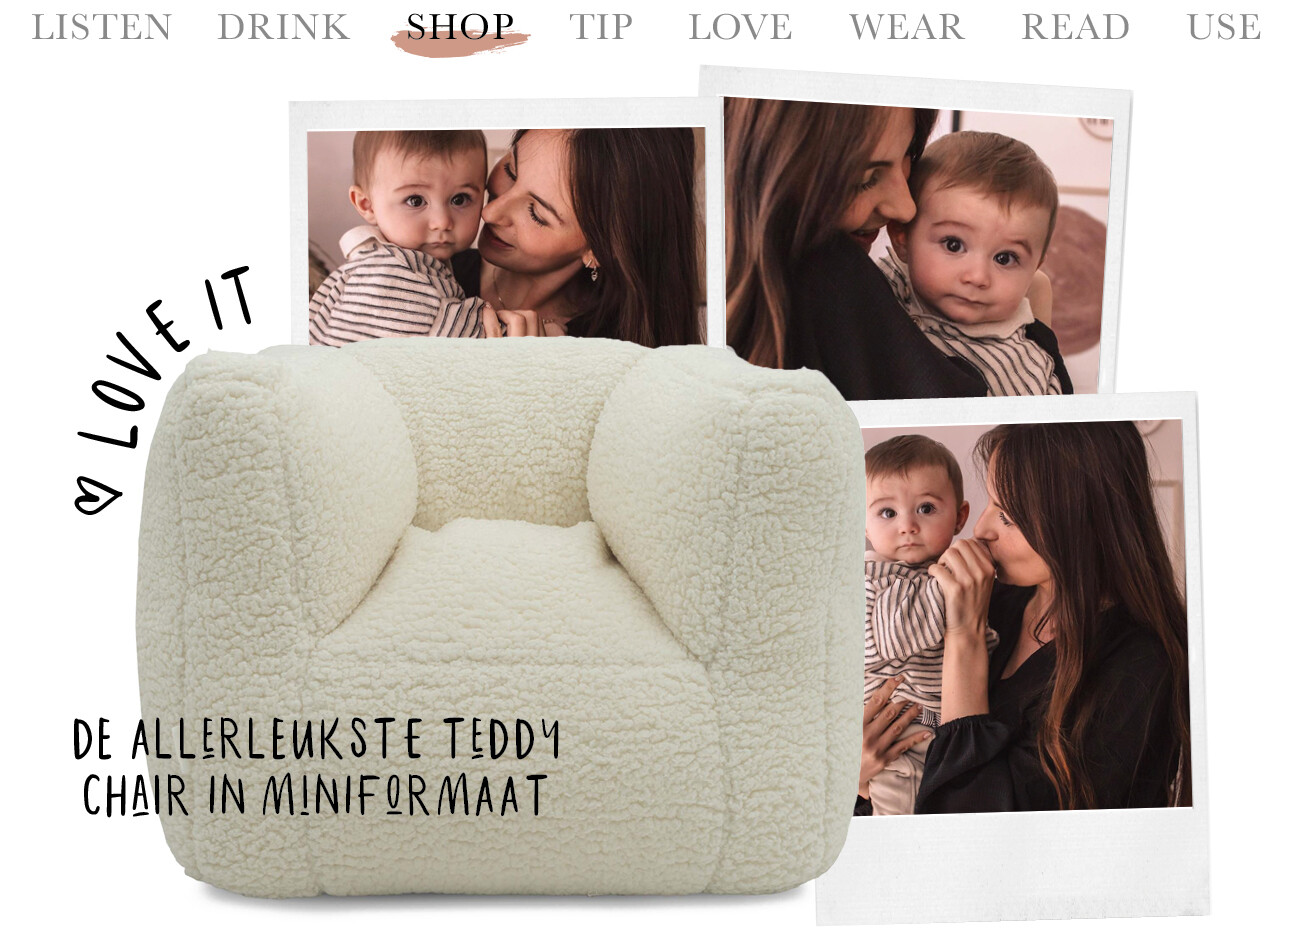 Teddychair mini formaat